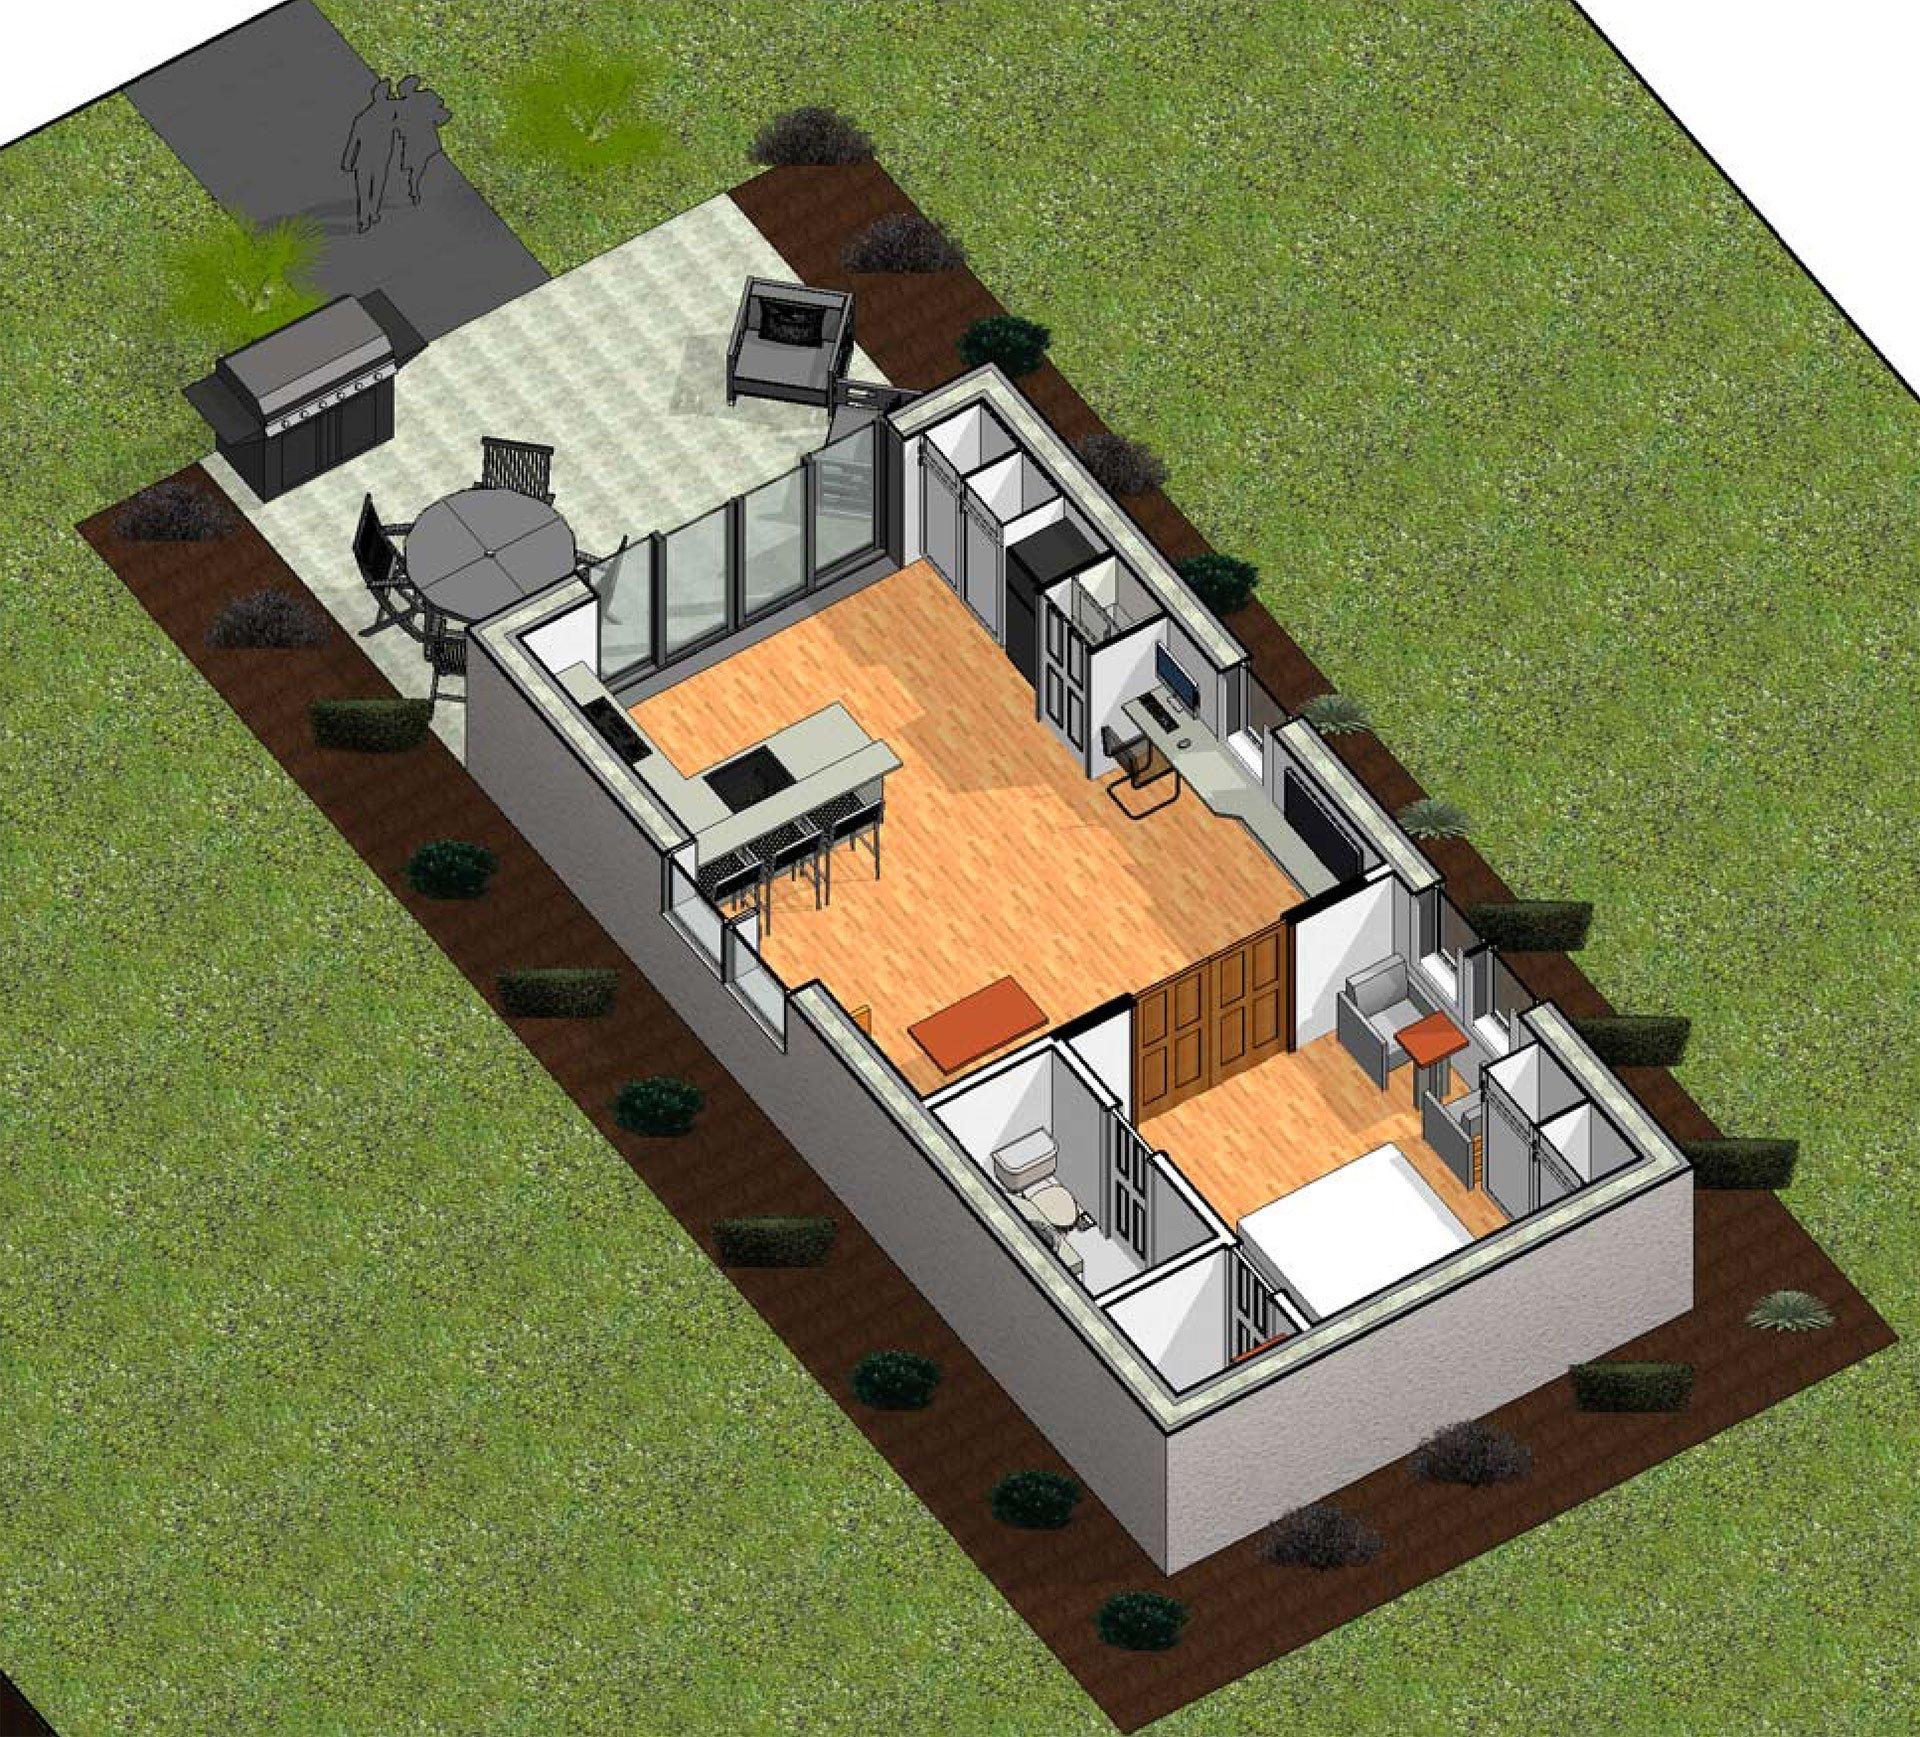 Leigh Overland Architect LLC